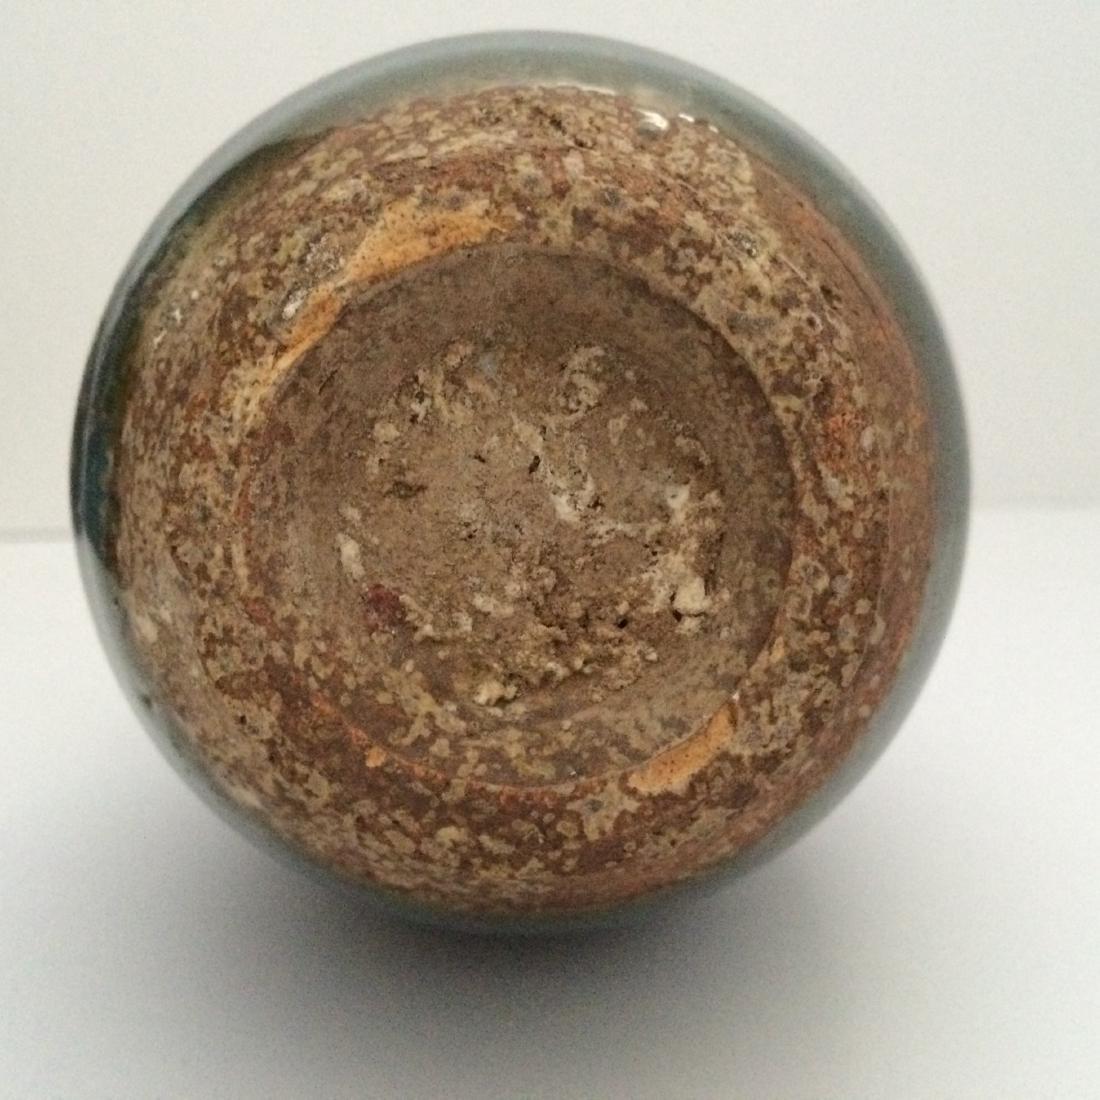 "Chinese Antique Porcelain Qun Ware Two Ear Vase (7""H) - 5"